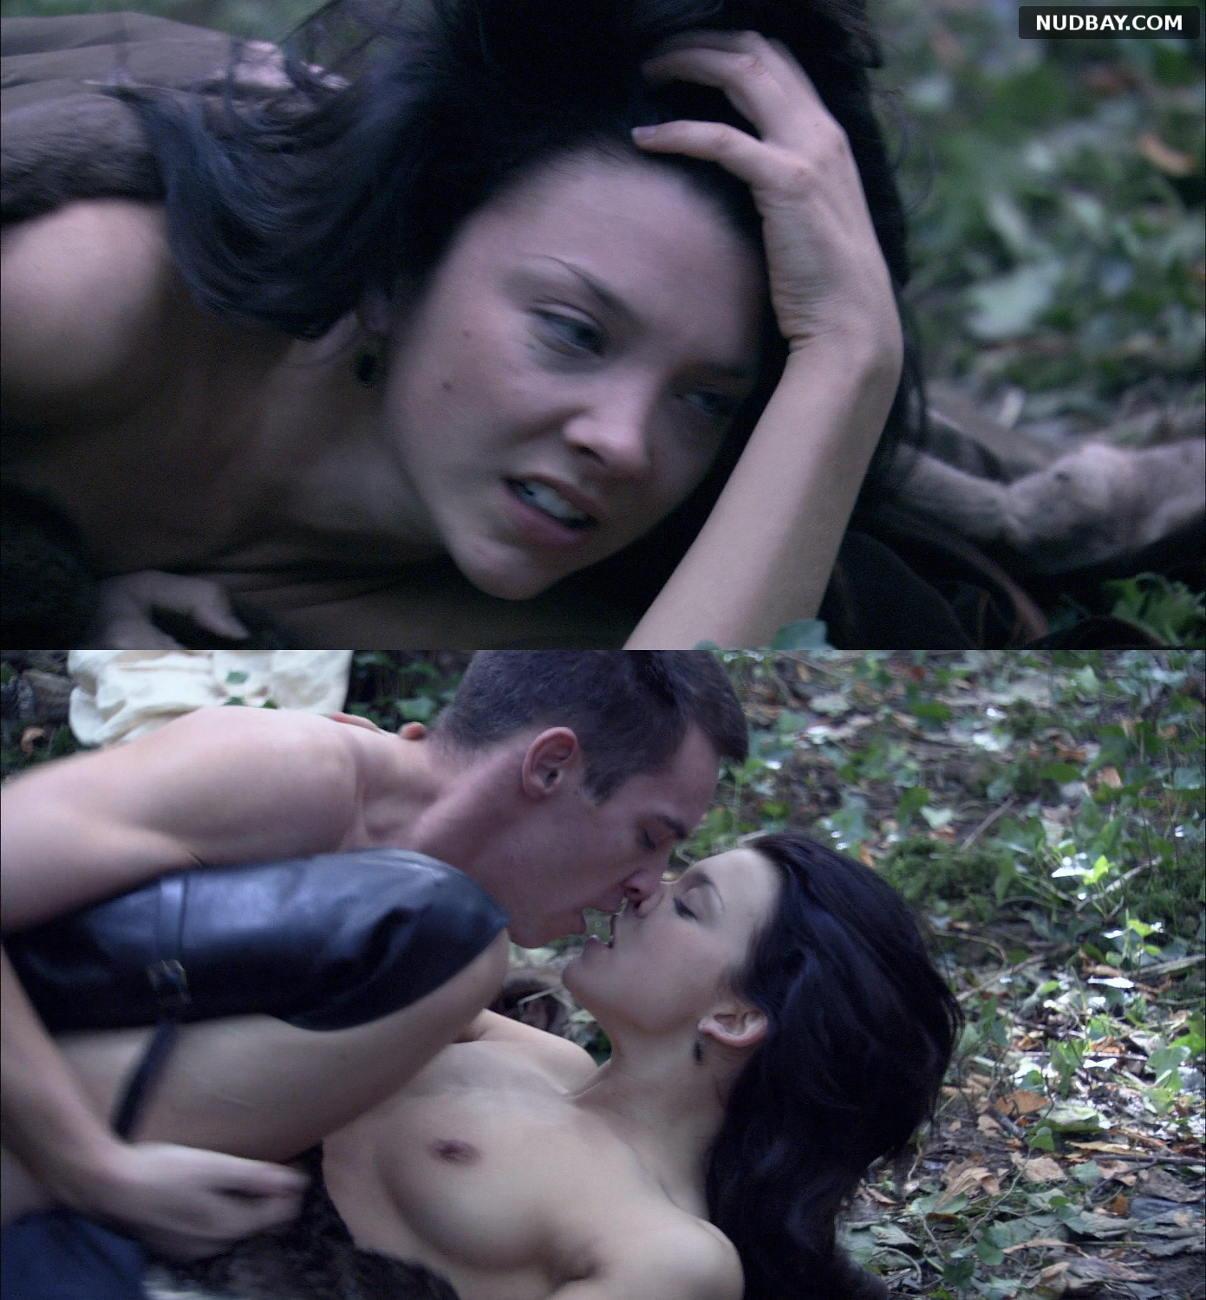 Natalie Dormer nude The Tudors (2007)